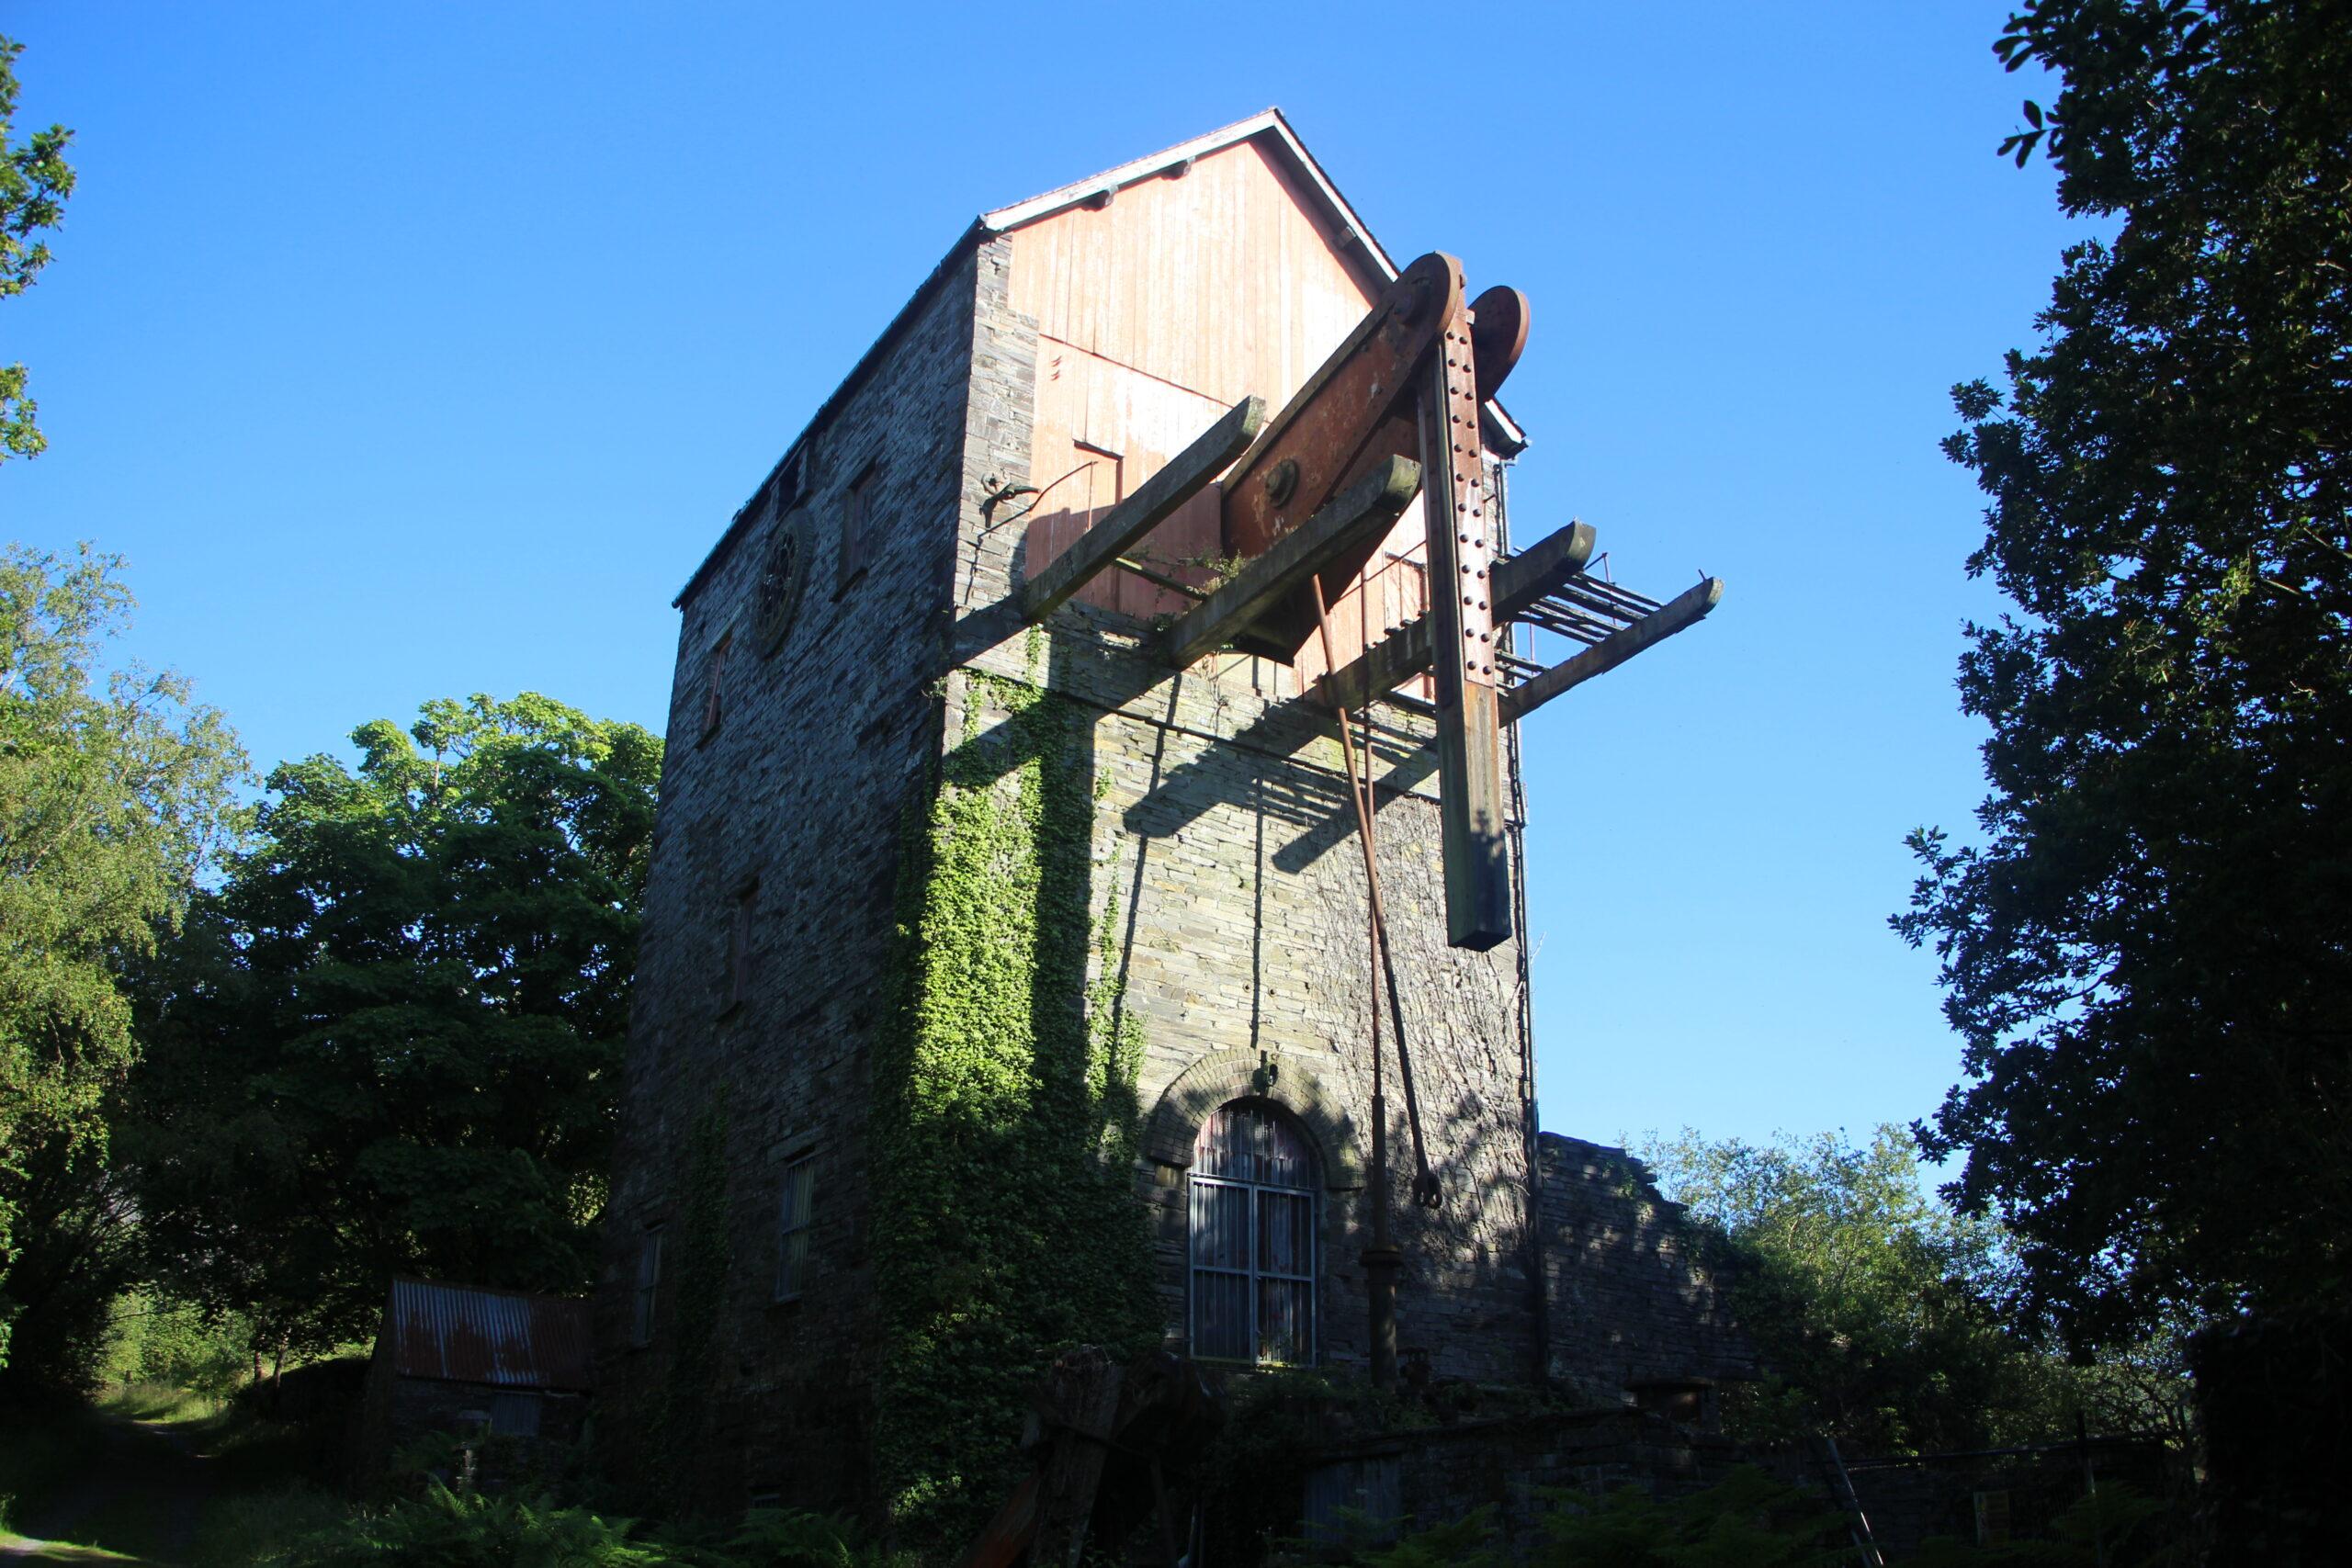 Engine house at Dorothea Quarry